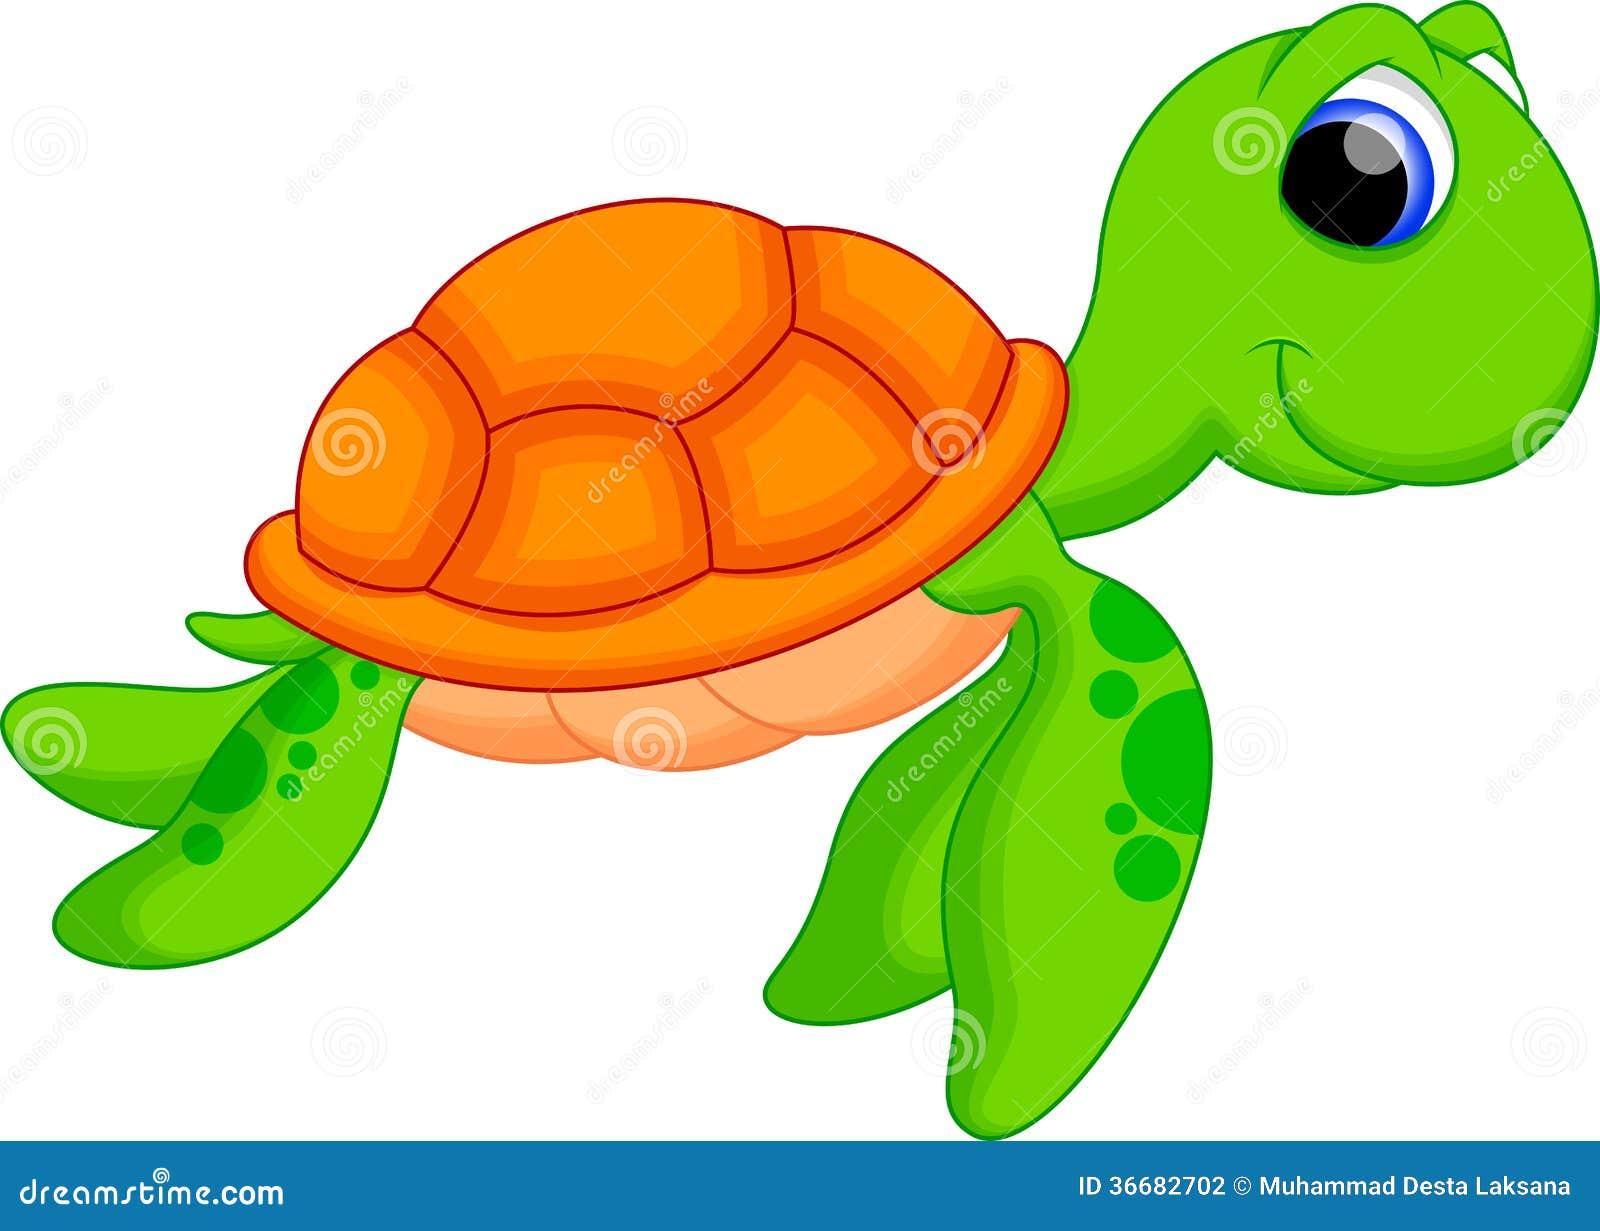 Cute animated sea turtles - photo#2